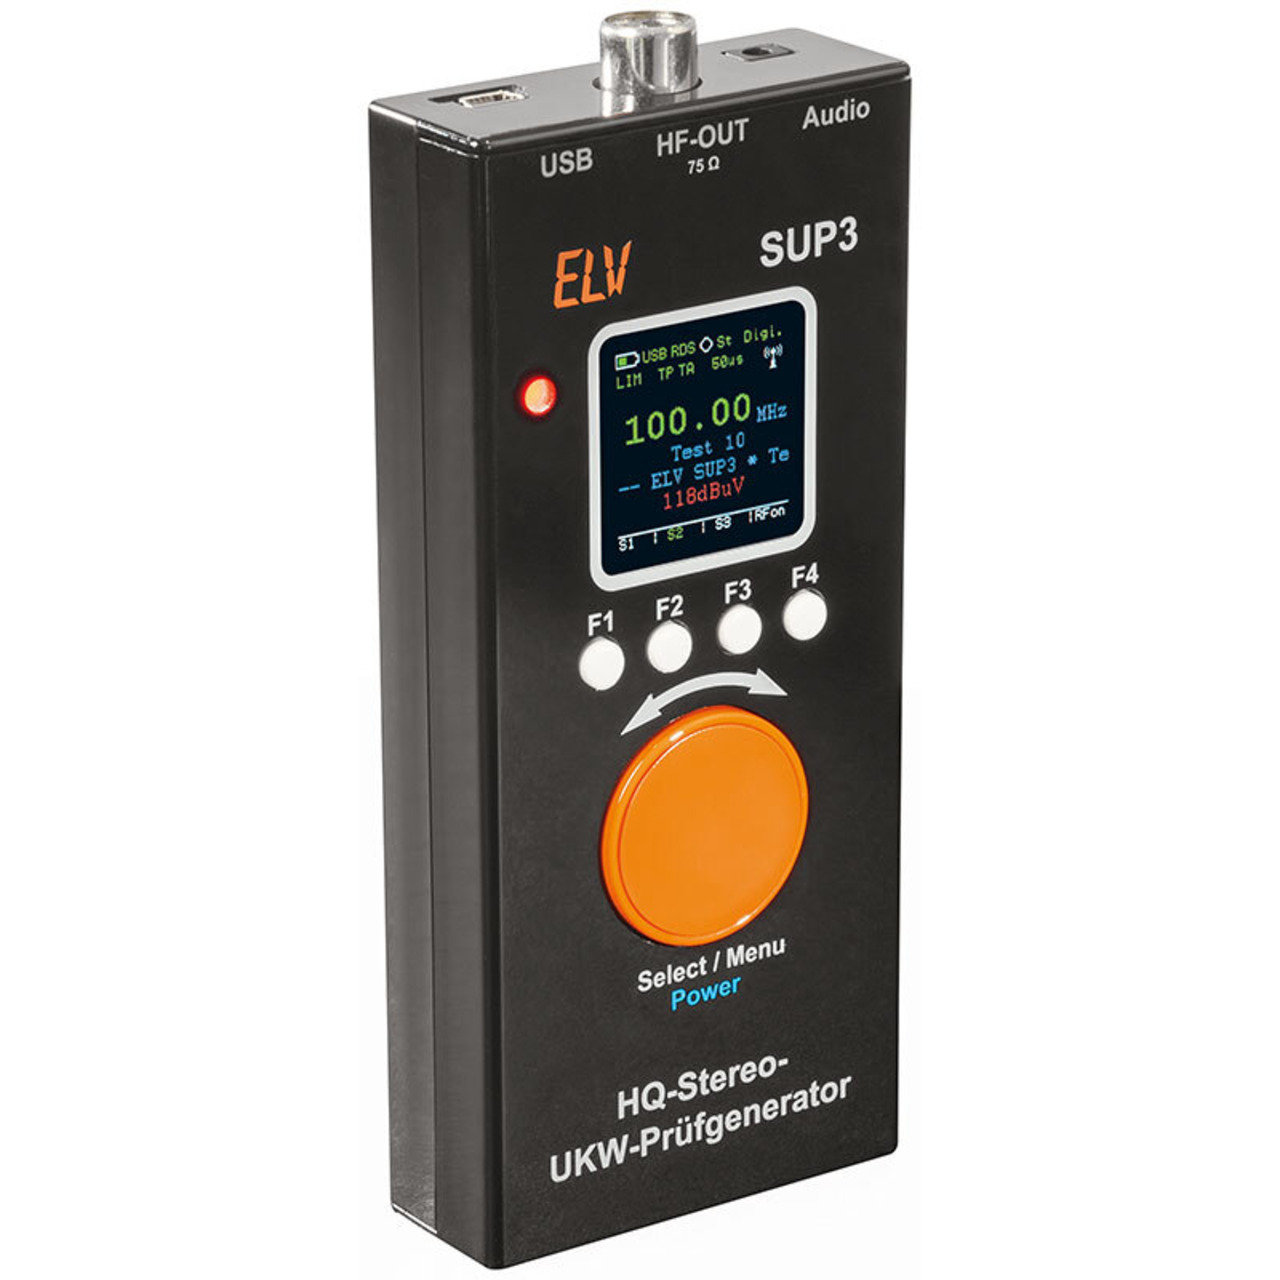 ELV Komplettbausatz HQ-Stereo-UKW-Prüfgenerator mit OLED-Display SUP 3